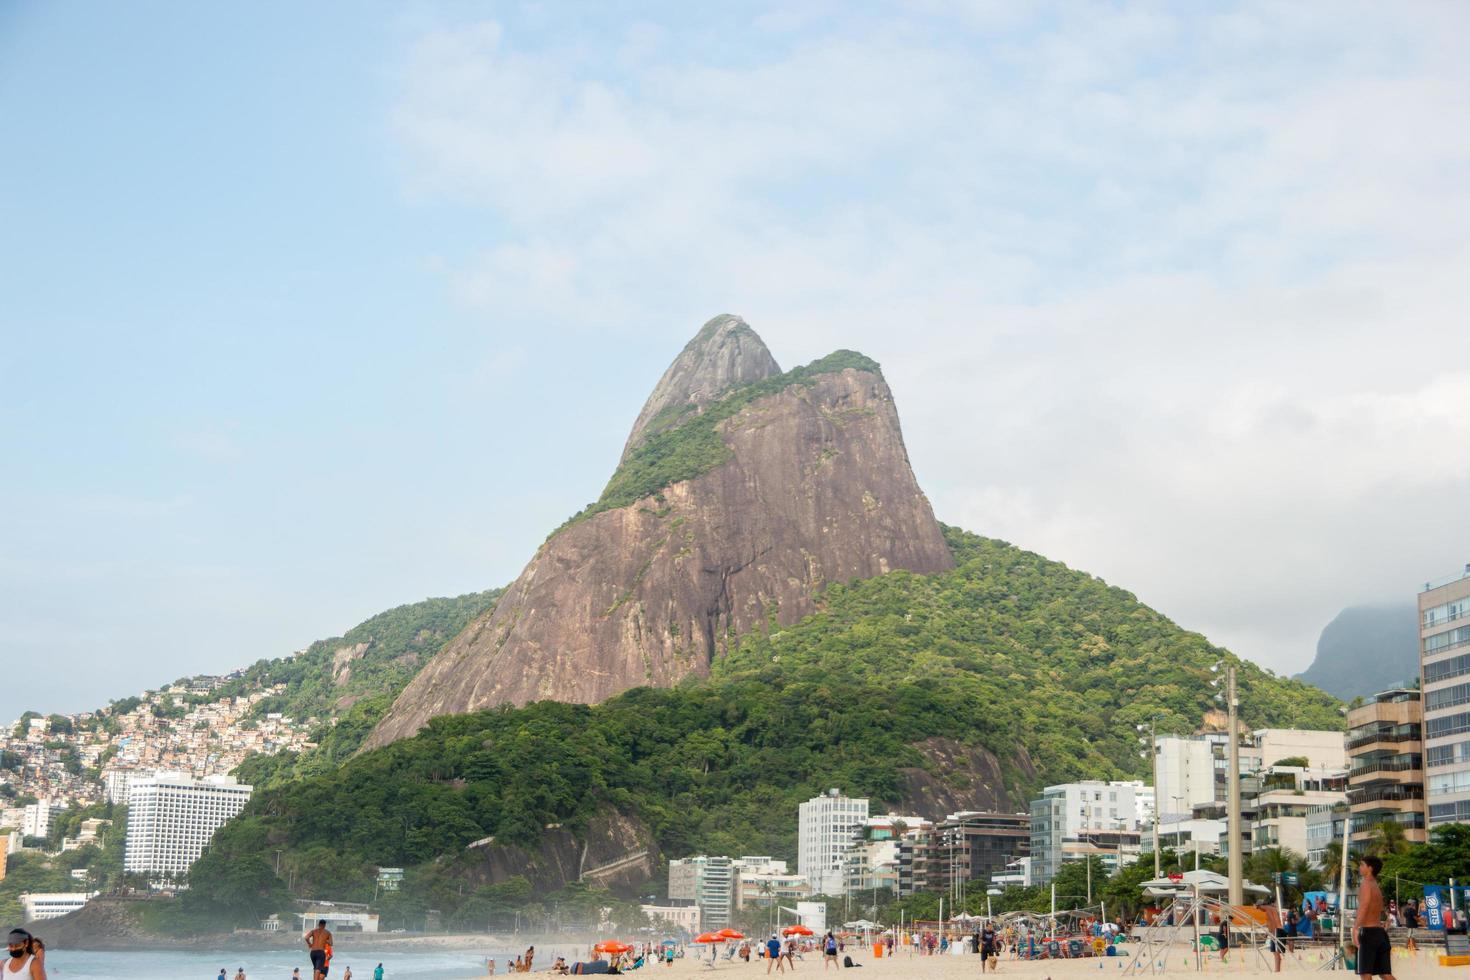 rio de janeiro, brasilien, 2015 - zweischanzenbruder foto